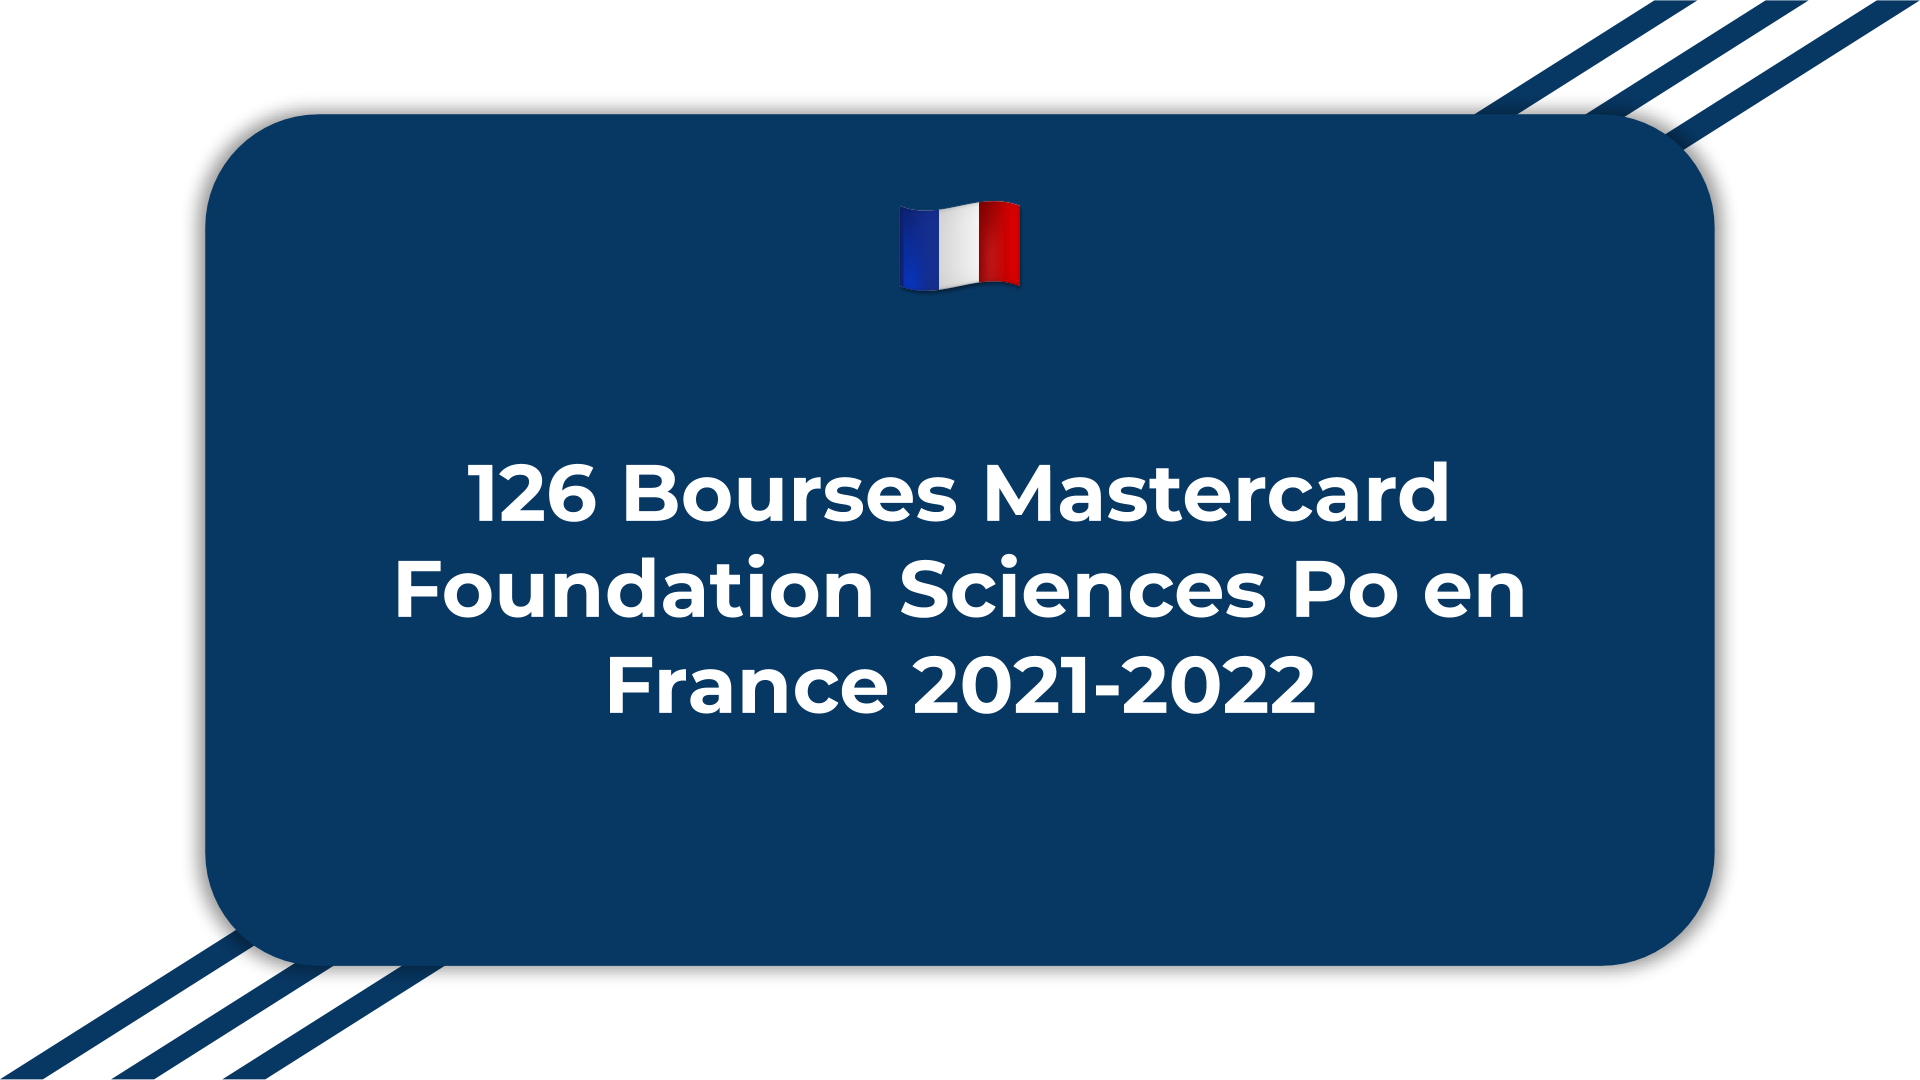 126 Bourses Mastercard Foundation Sciences Po